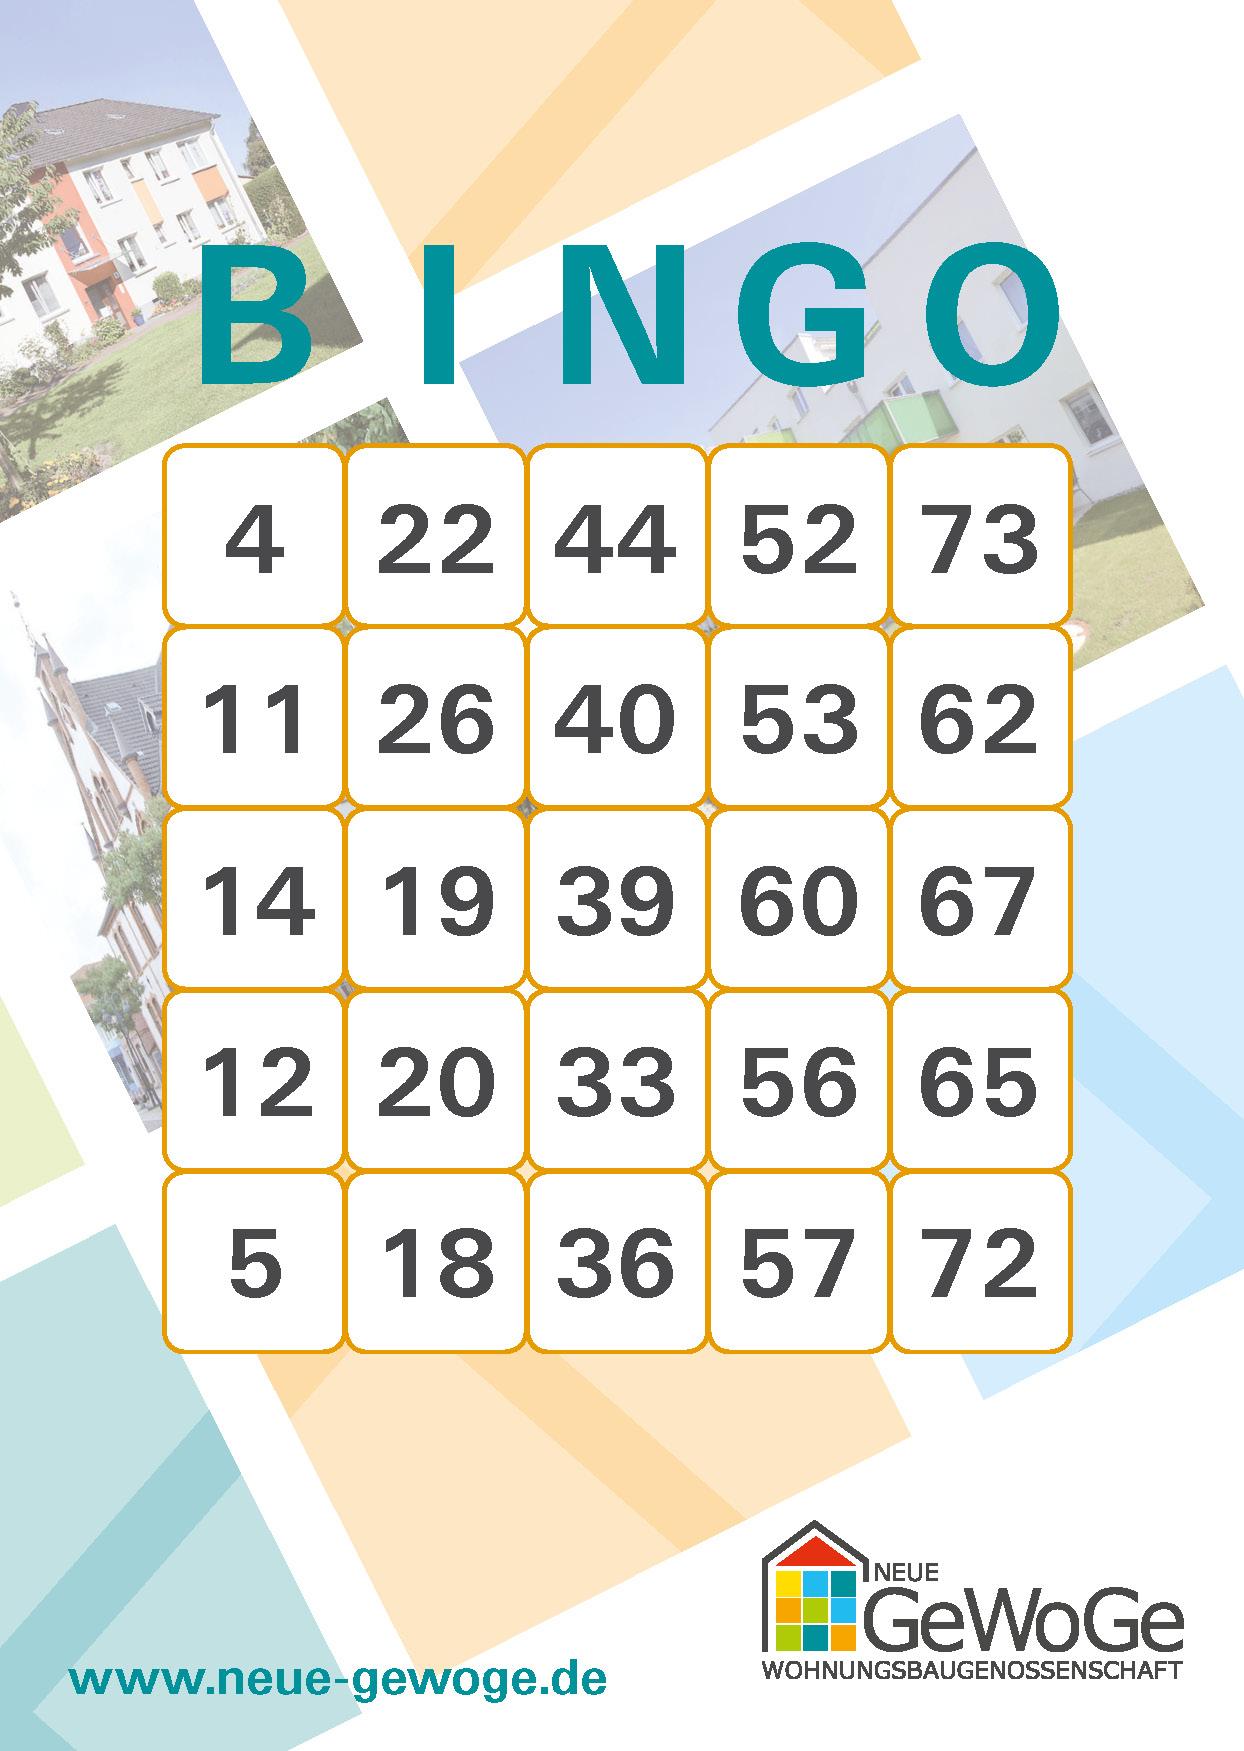 Bingolose